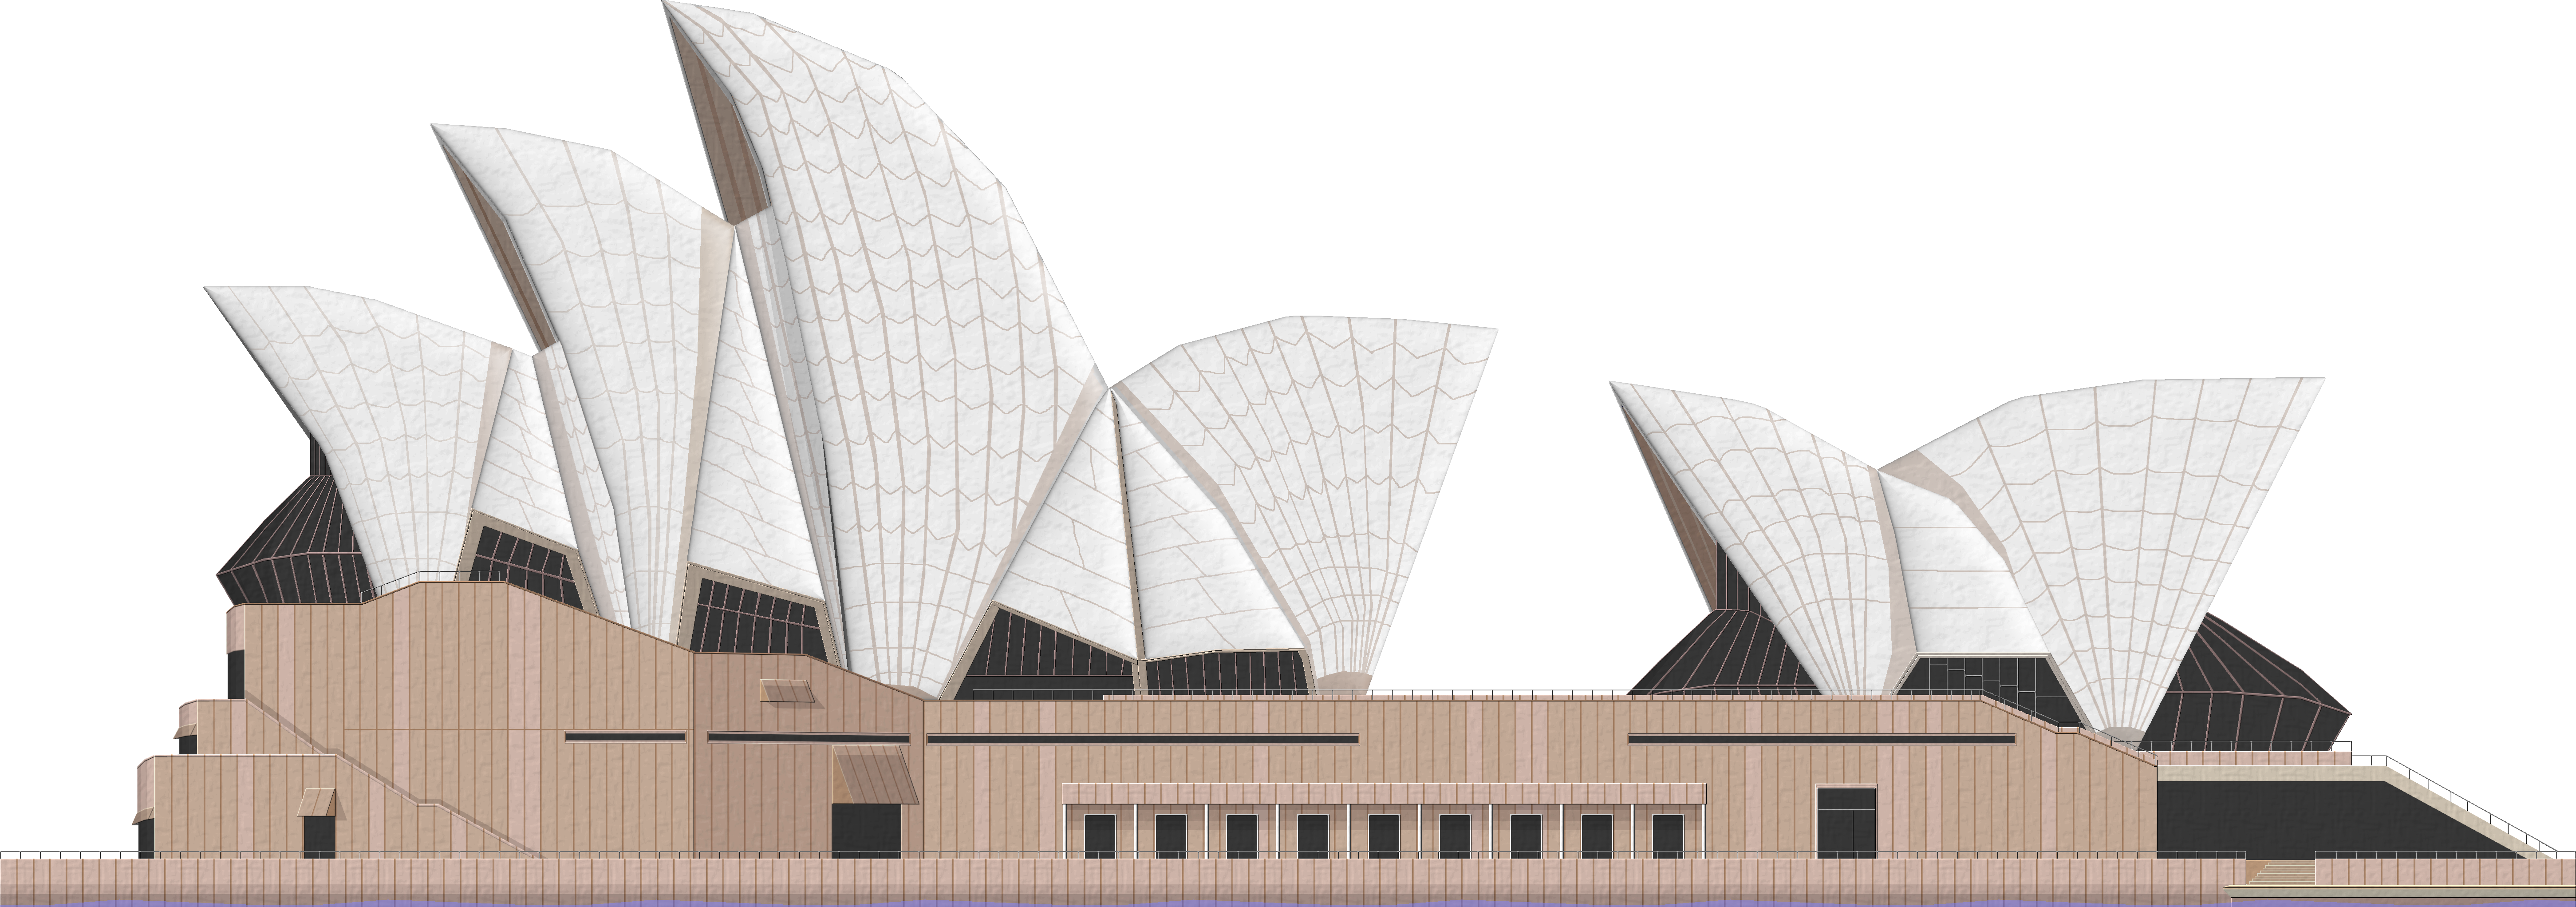 PNG Sydney Opera House - 57795